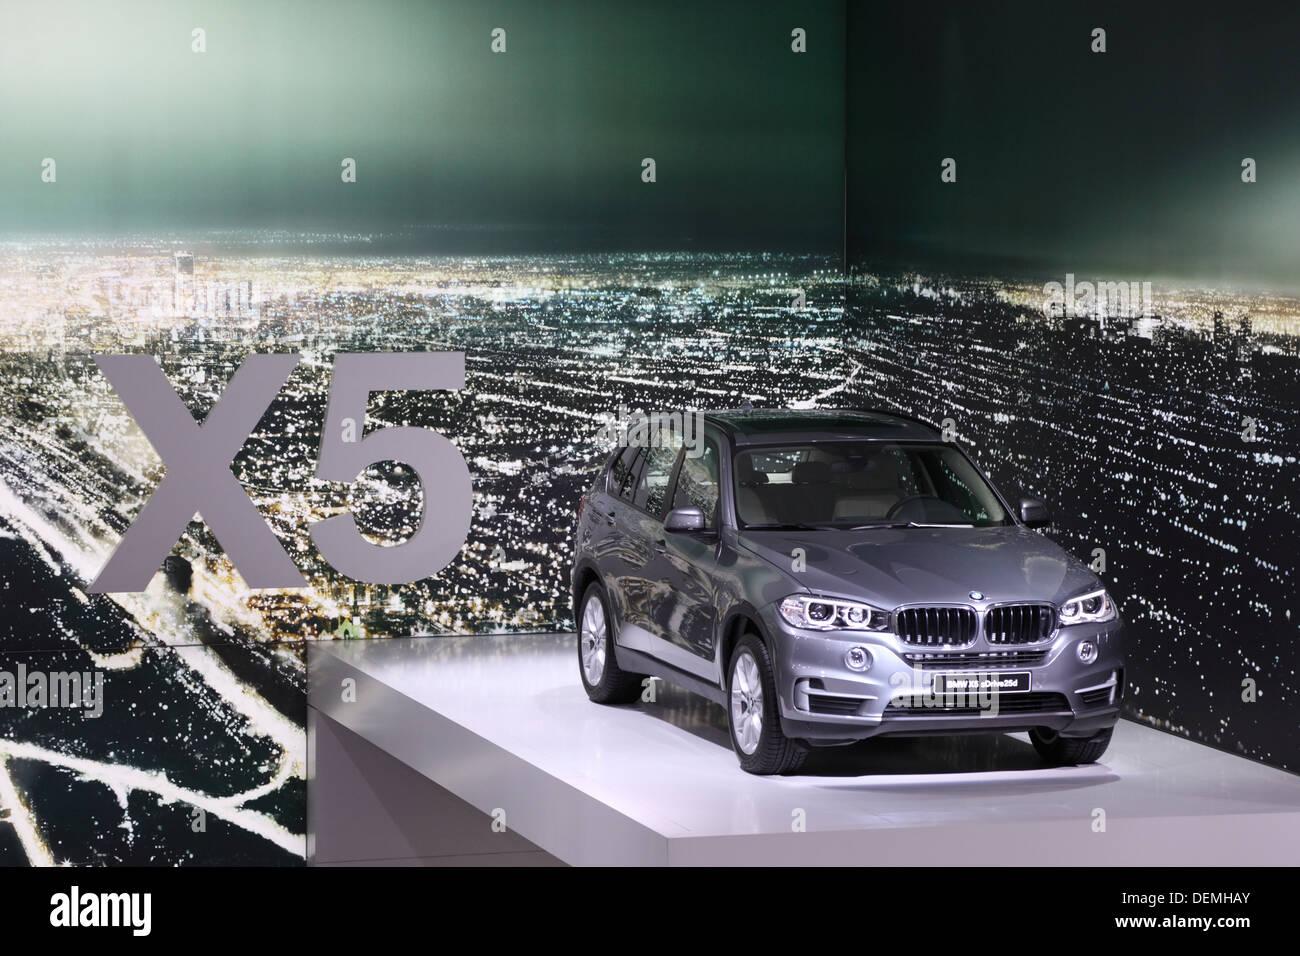 BMW X5 suv at the 65th IAA in Frankfurt, Germany - Stock Image